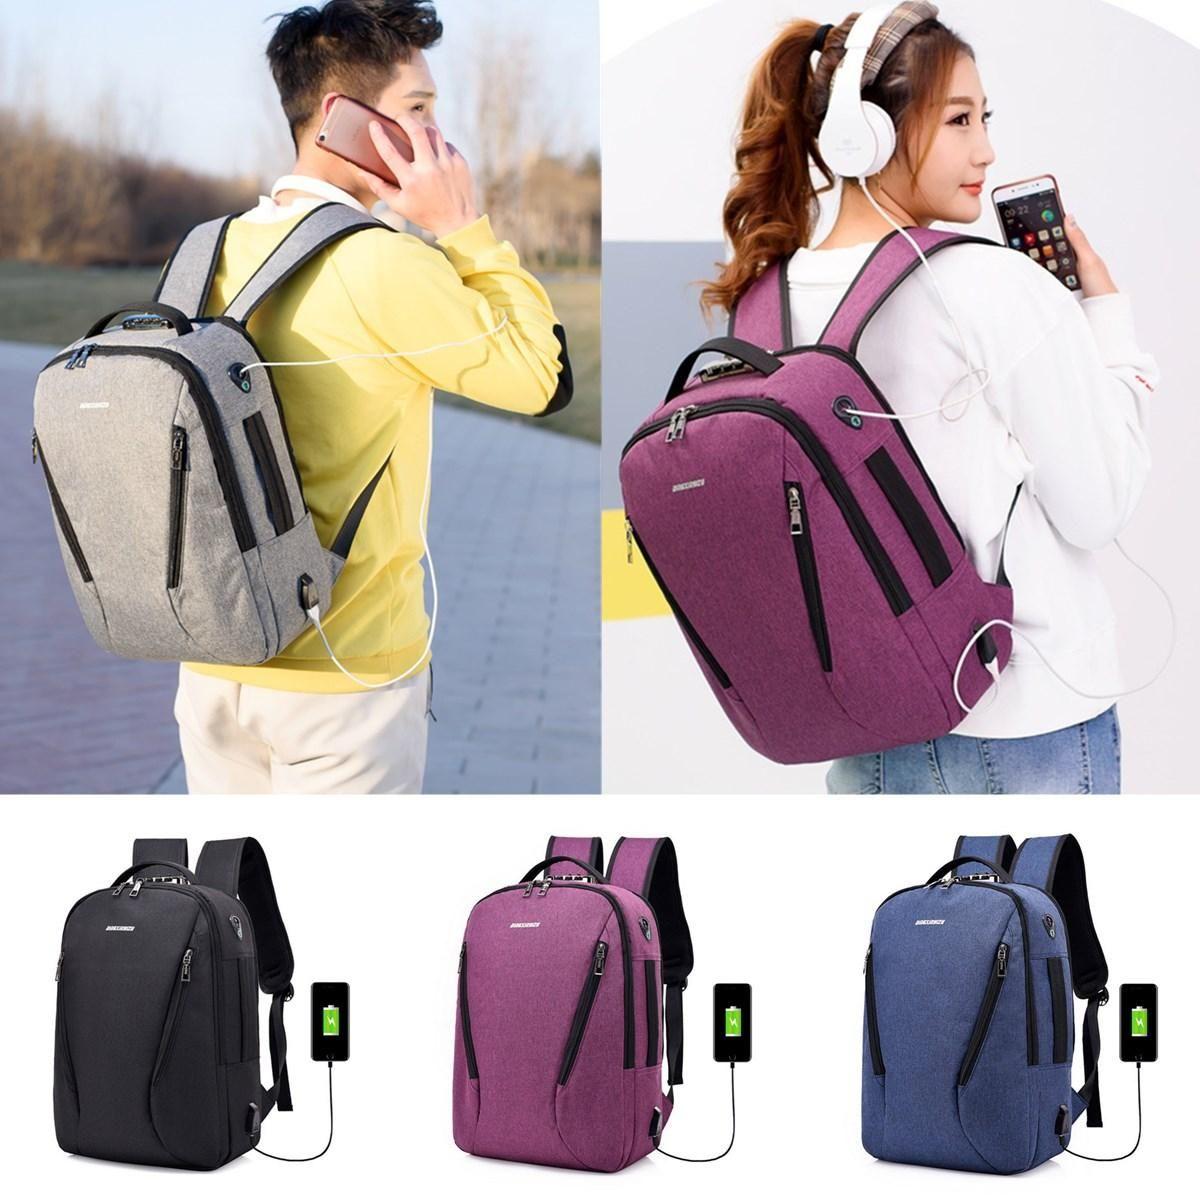 c543043d6723 17L Anti-theft Men Women Laptop Notebook Backpack USB Charging Port ...